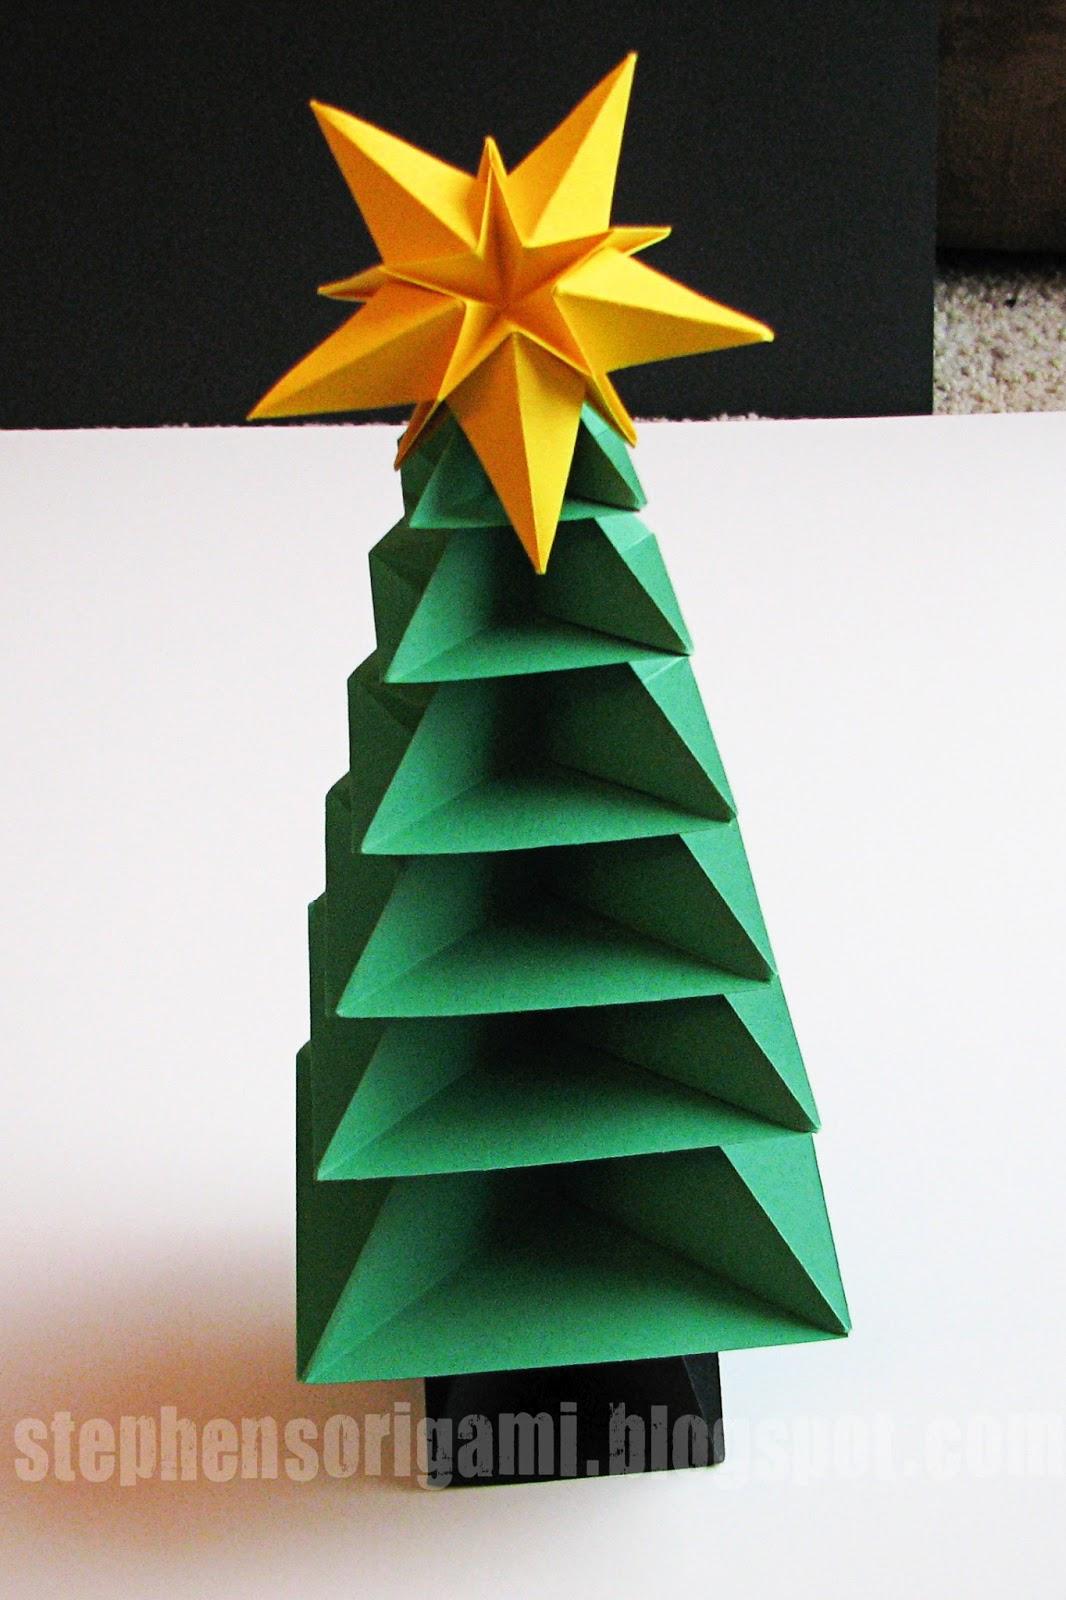 Stephen's Origami: Origami Christmas Tree Tutorial - photo#17